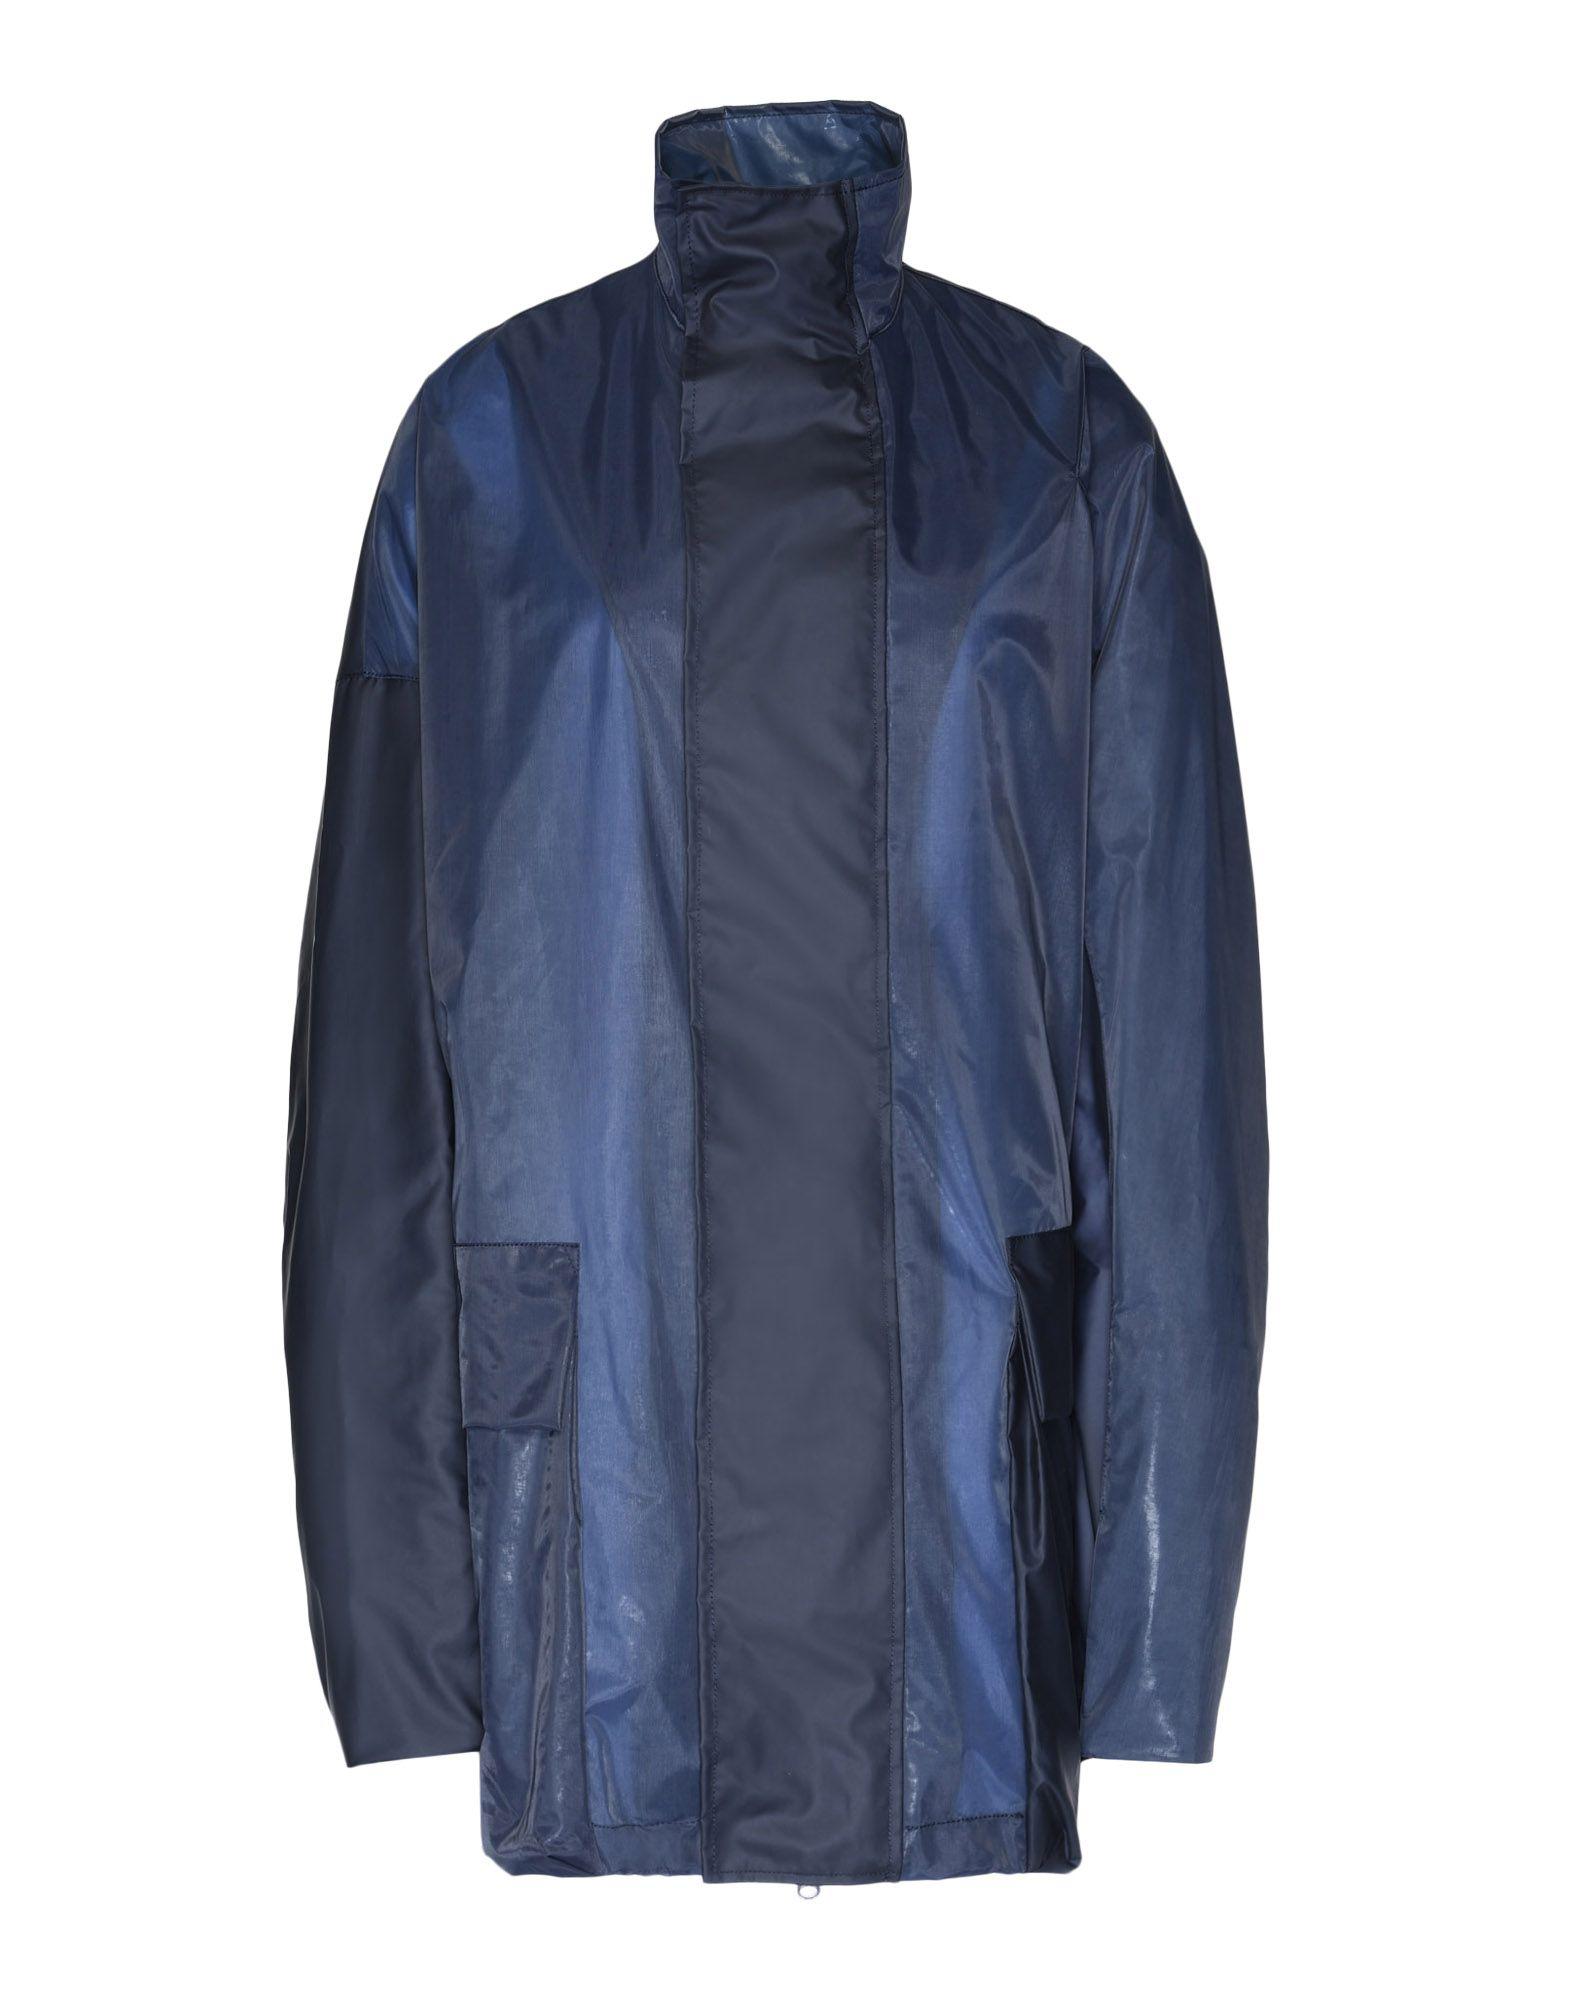 Y-3 Y-3 Patchwork Anorak Jacket Jacket Woman f